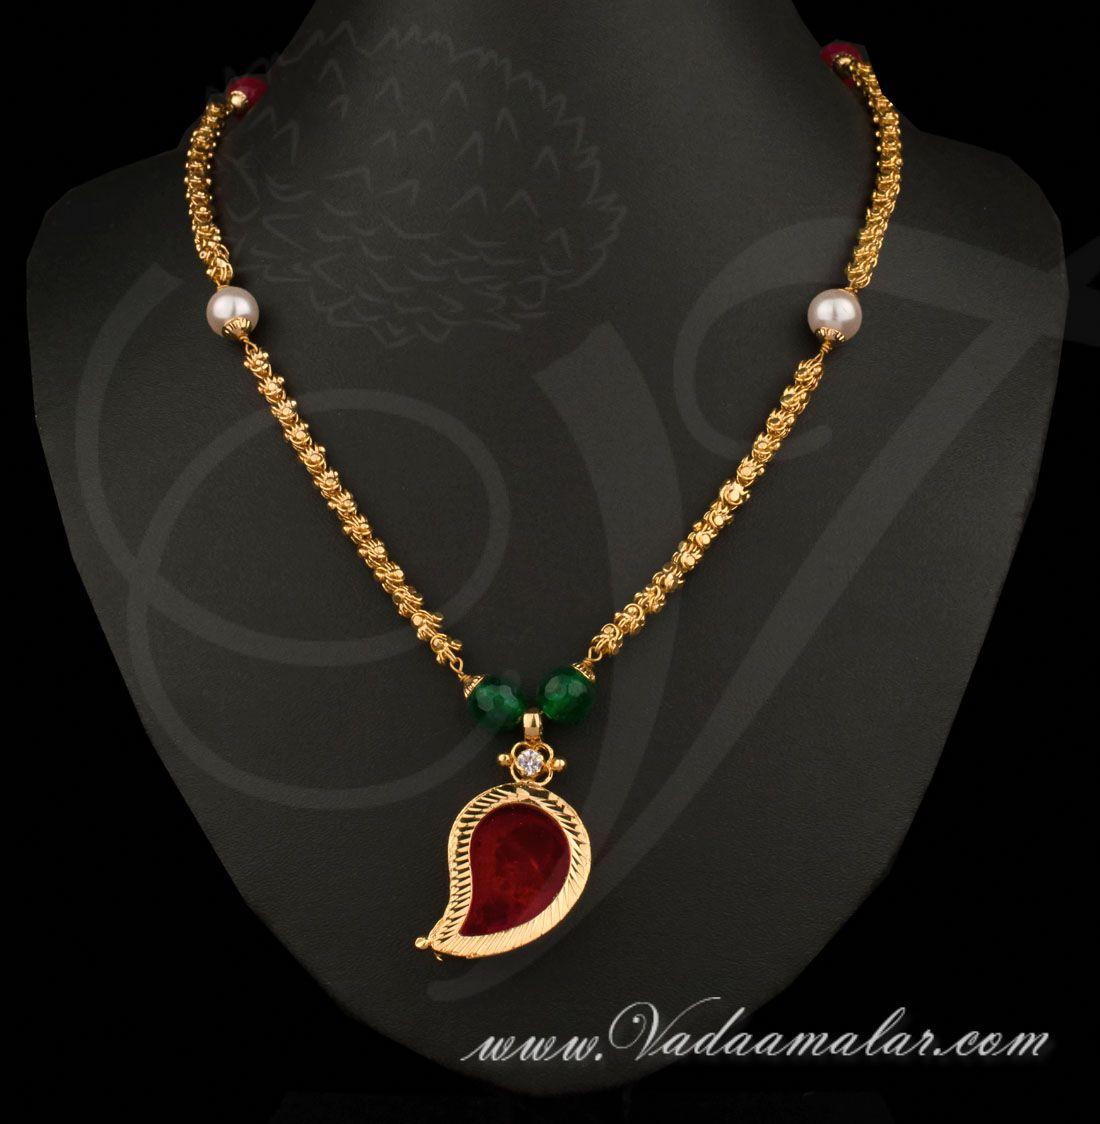 Pin by selvakumari jayarajan on jewellery designs in